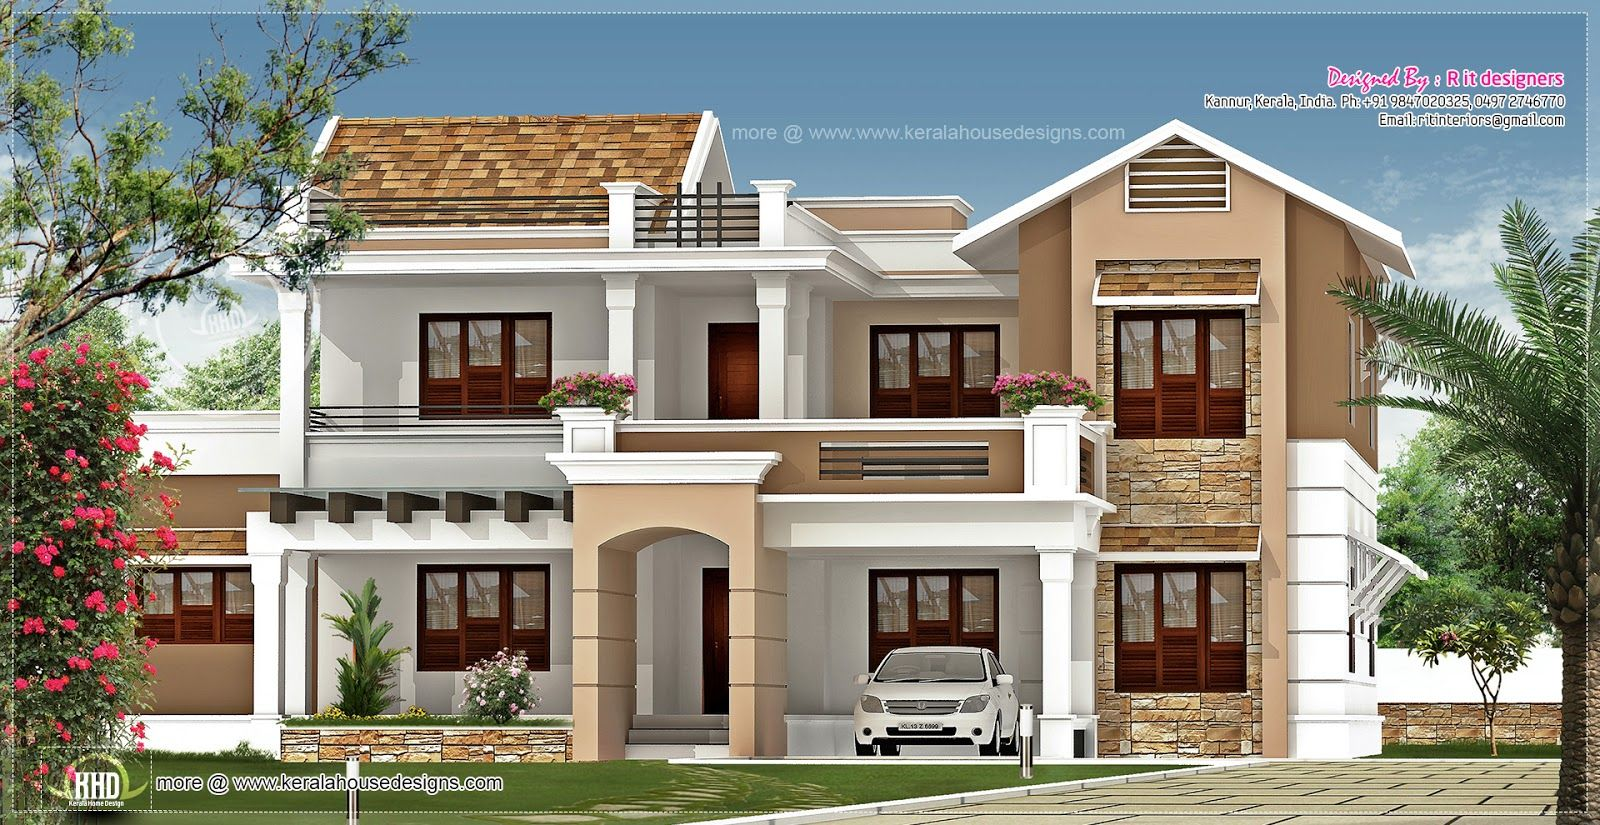 800 Square Foot House Exterior Design 347 Square Yards Designed